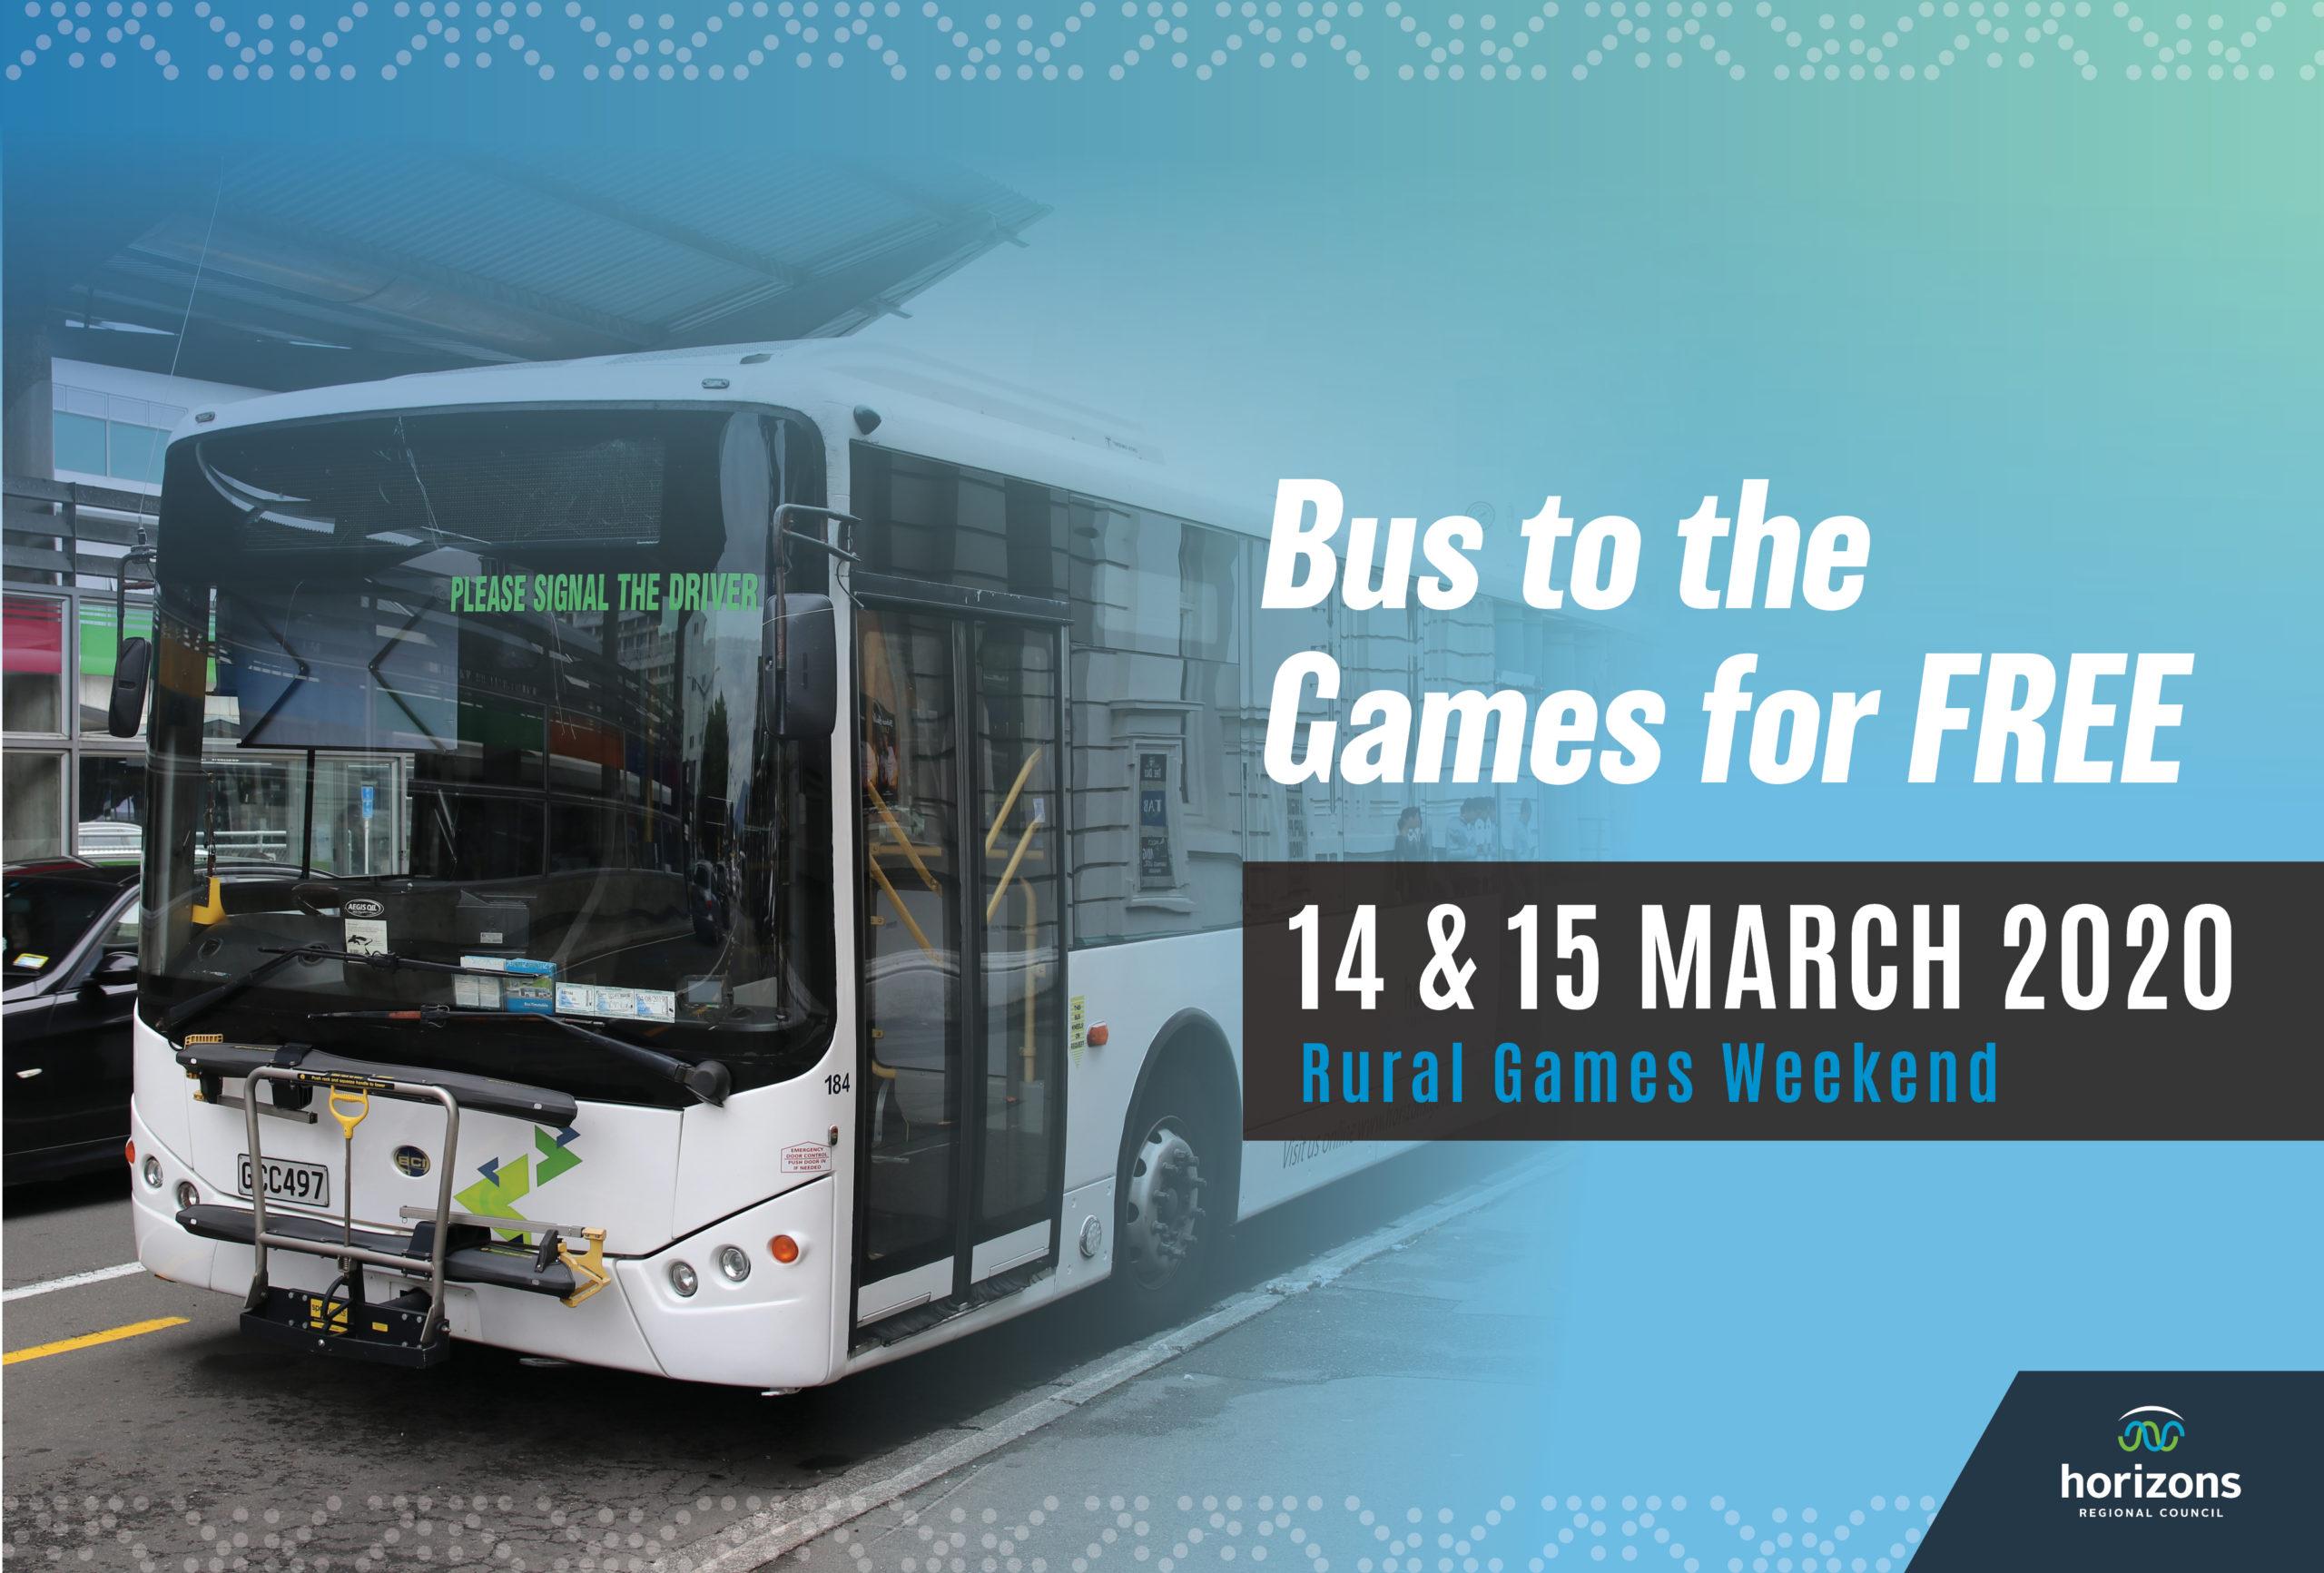 The Great Rural Games Free Bus Weekend